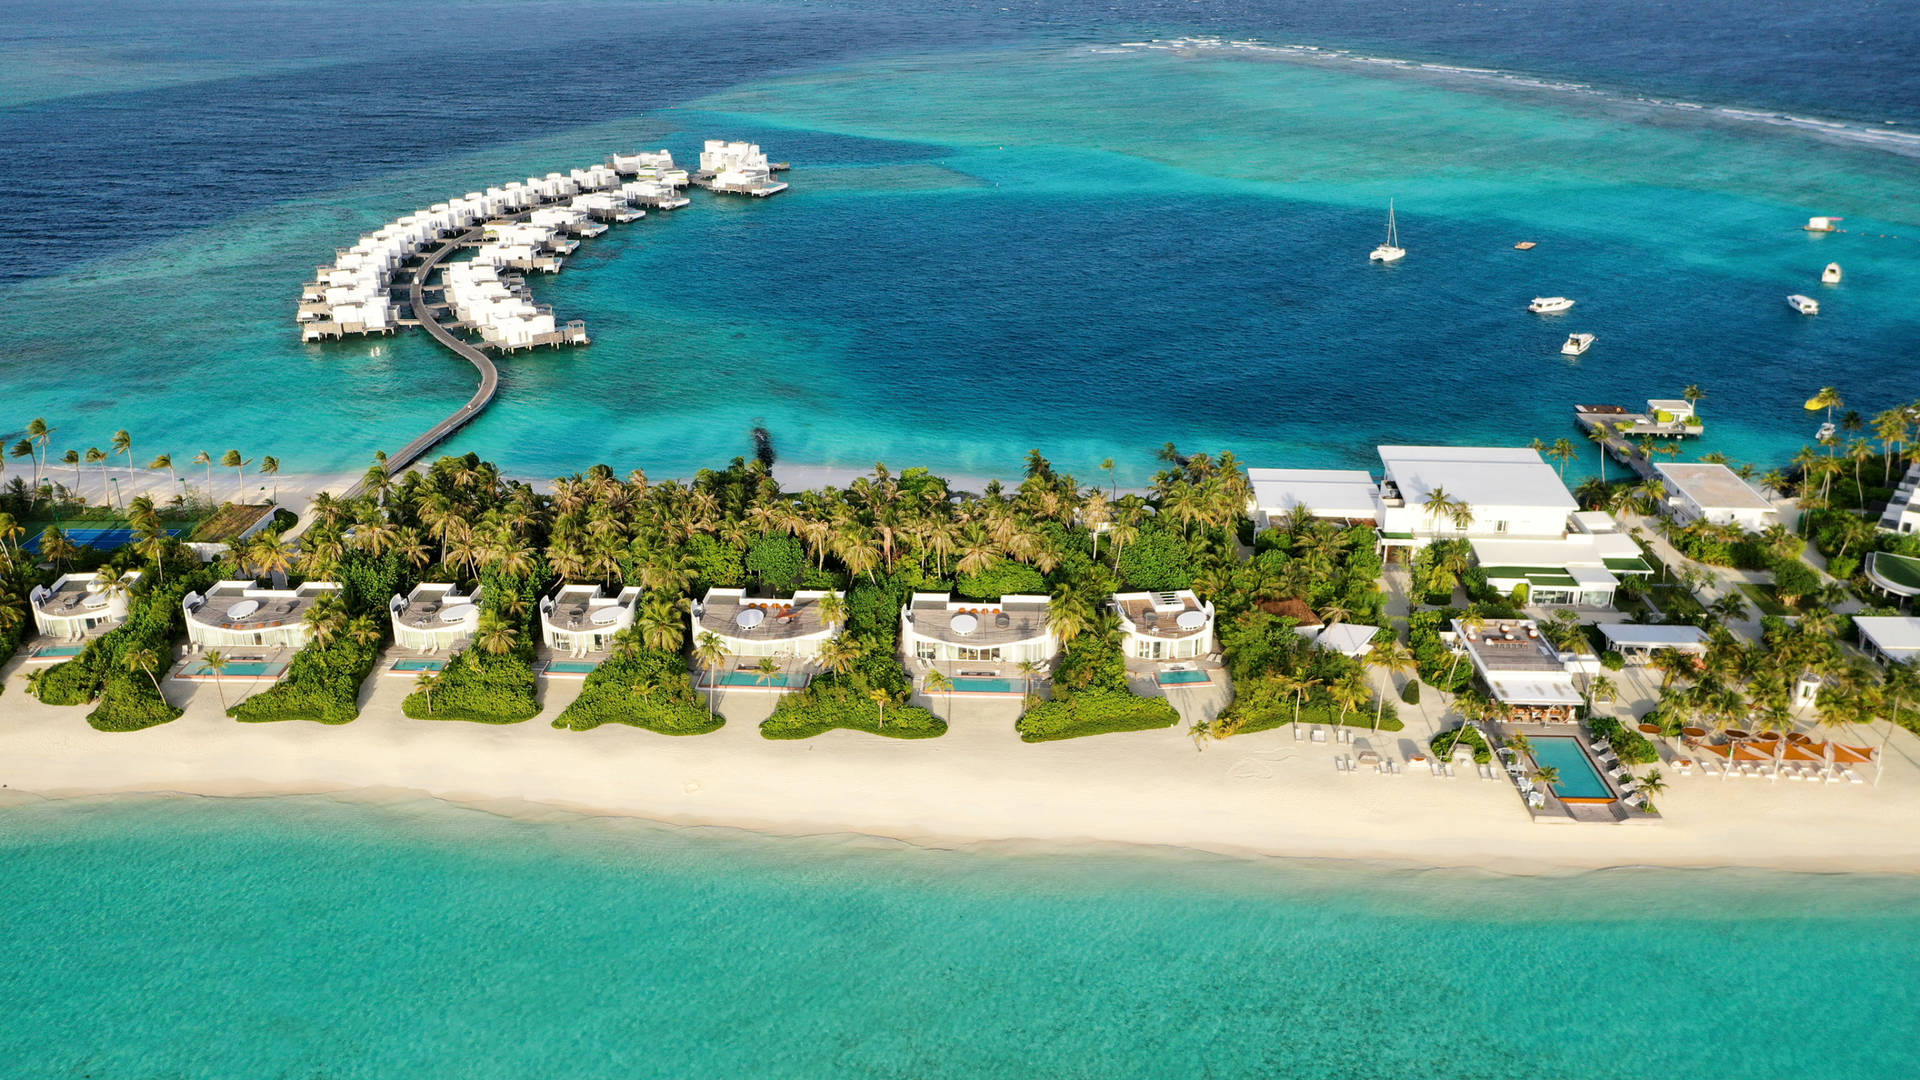 Aeiral view of the private white-sand beach at Jumeirah Maldives